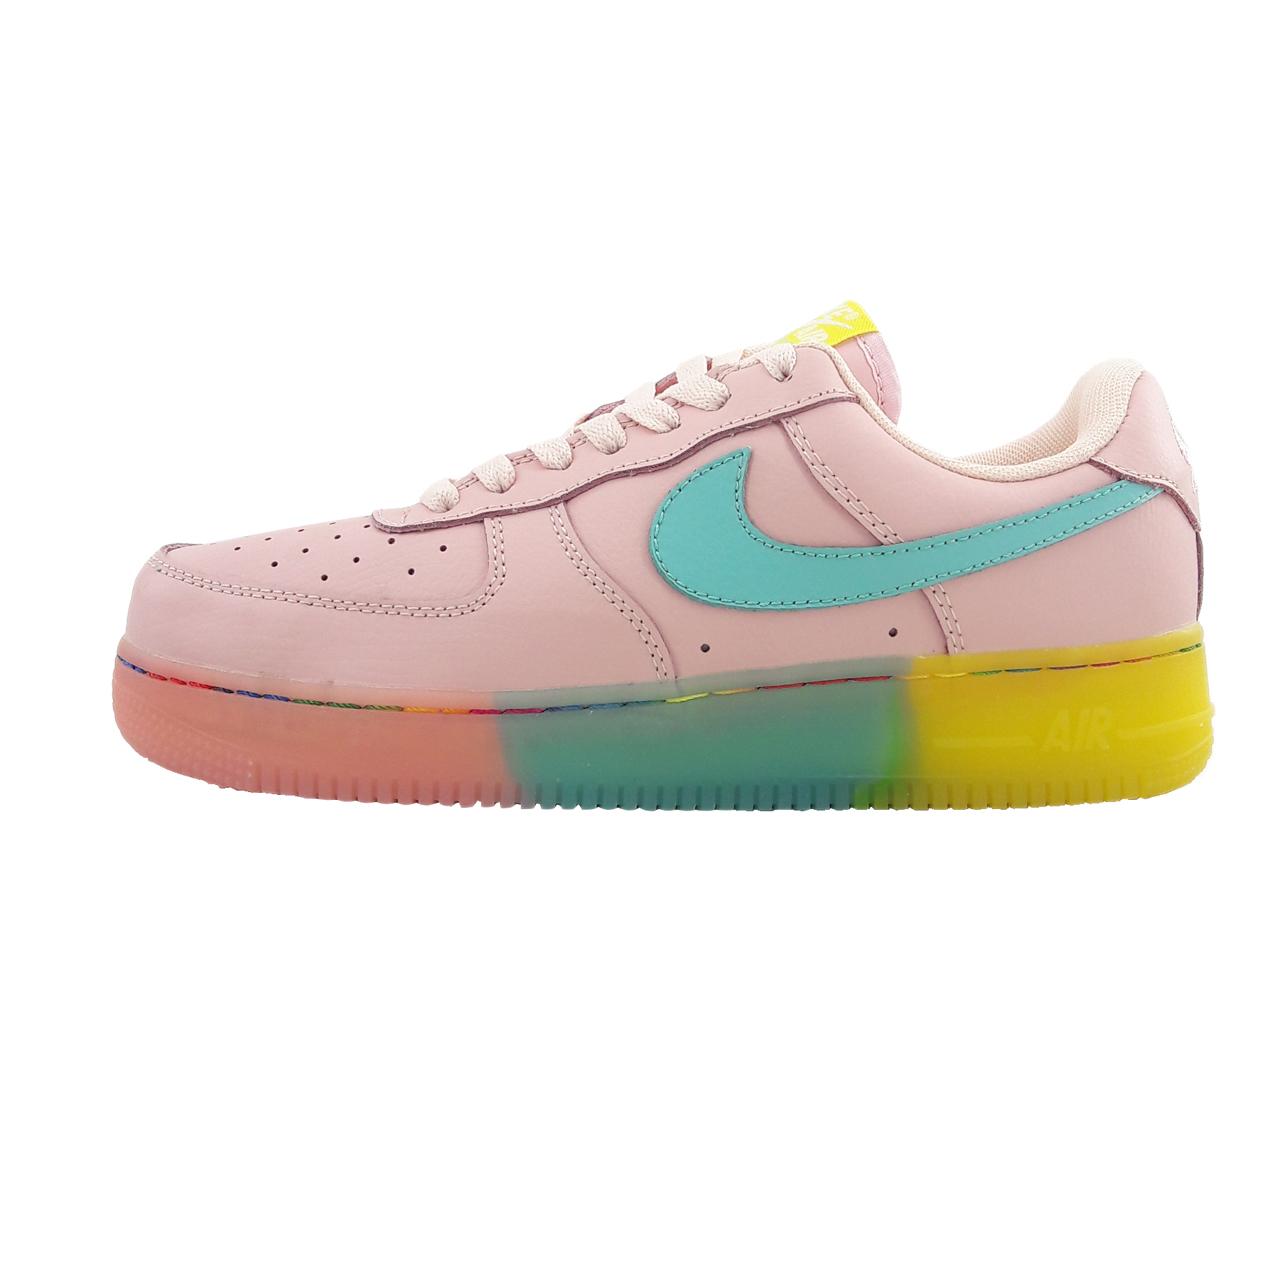 کفش راحتی زنانه نایکی مدل Air Force